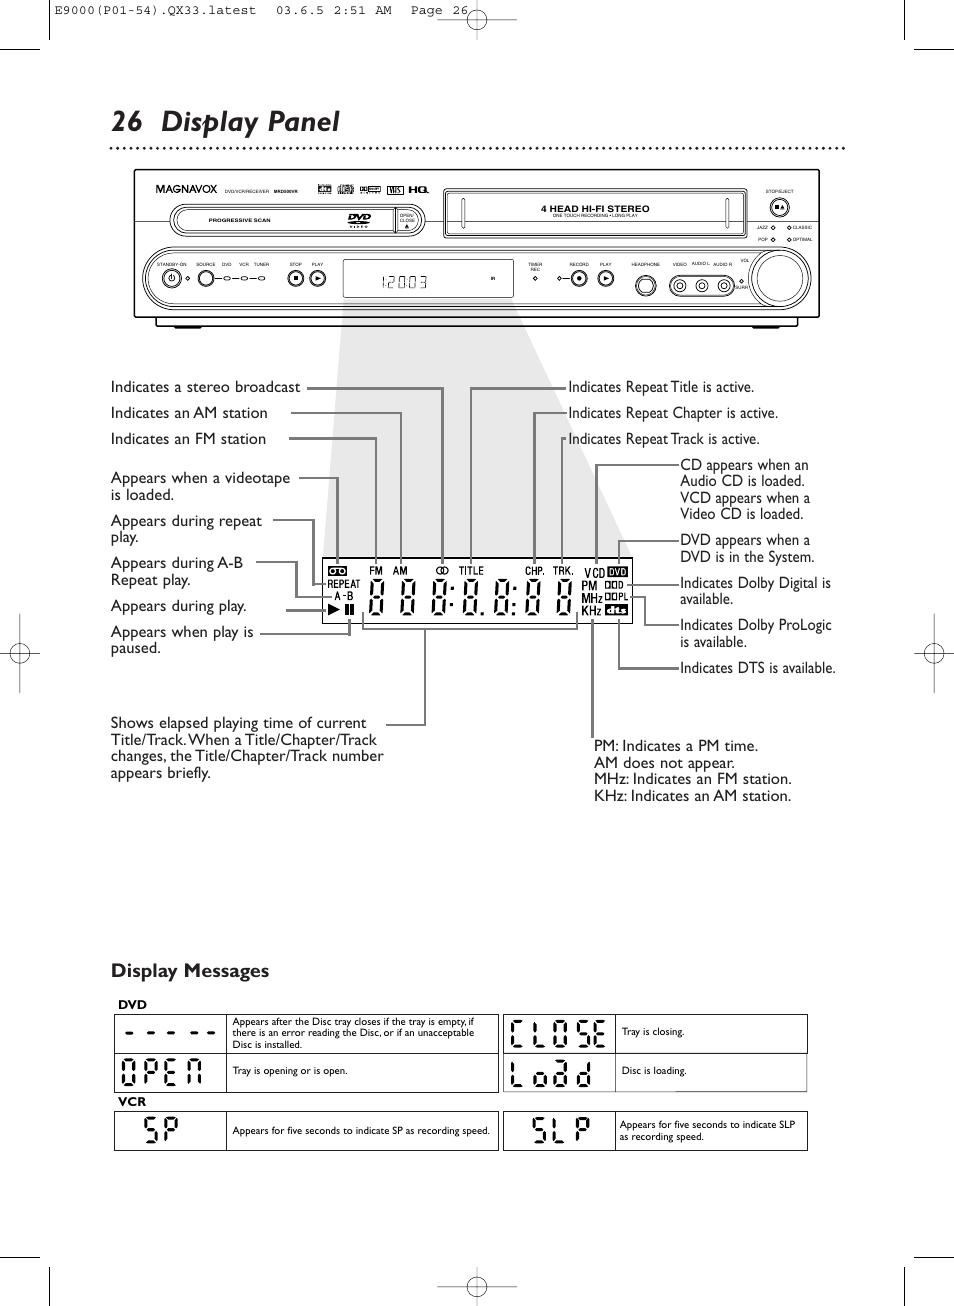 26 display panel display messages philips magnavox mrd500vr user rh manualsdir com